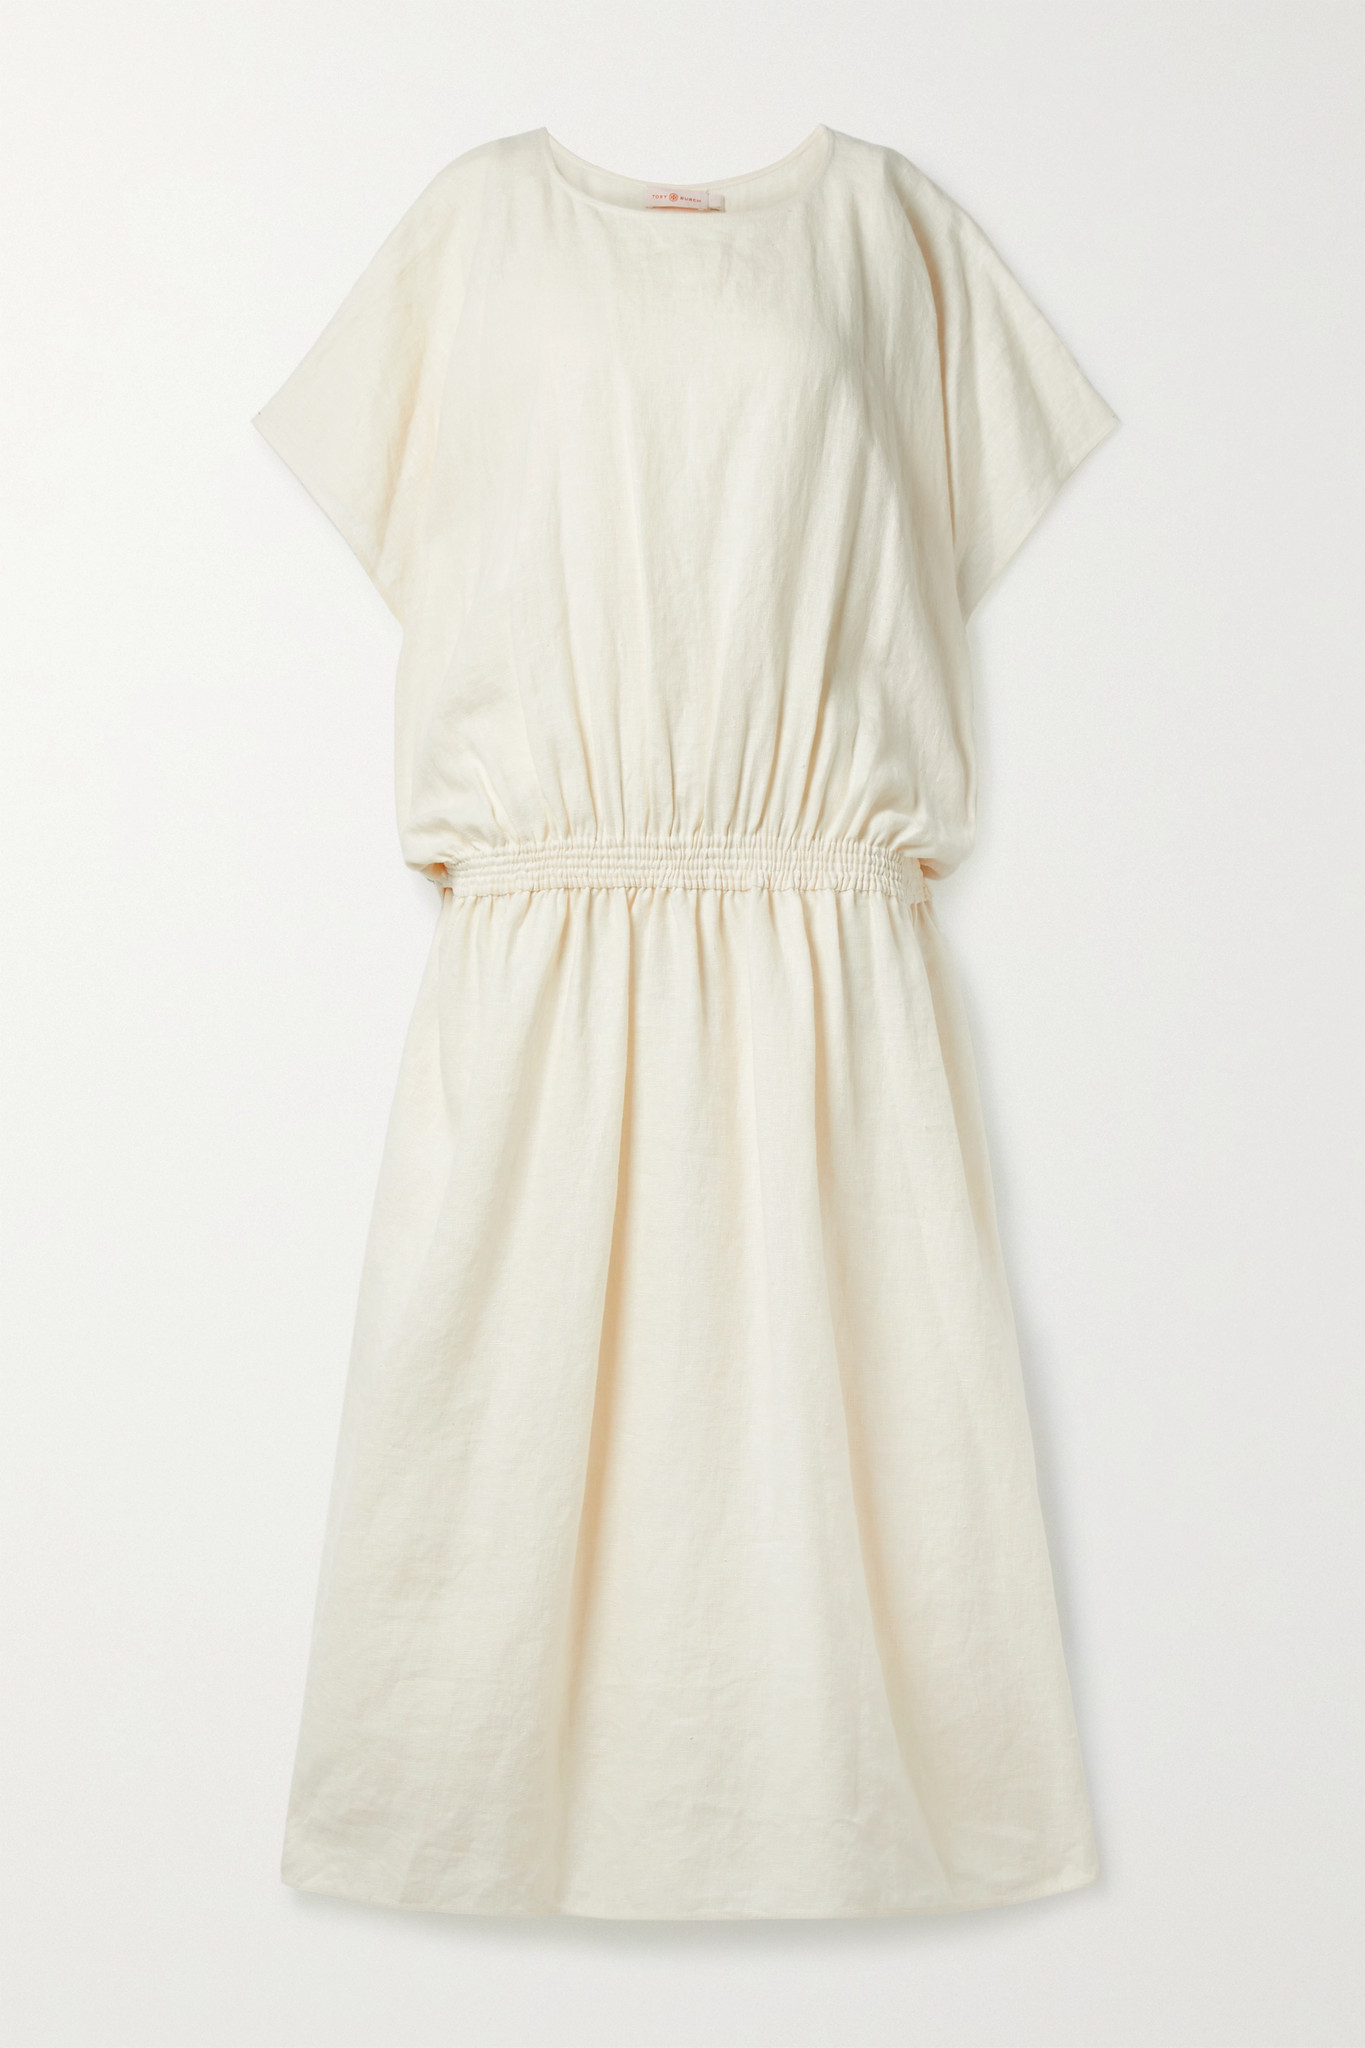 TORY BURCH - Shirred Linen Maxi Dress - Cream - medium